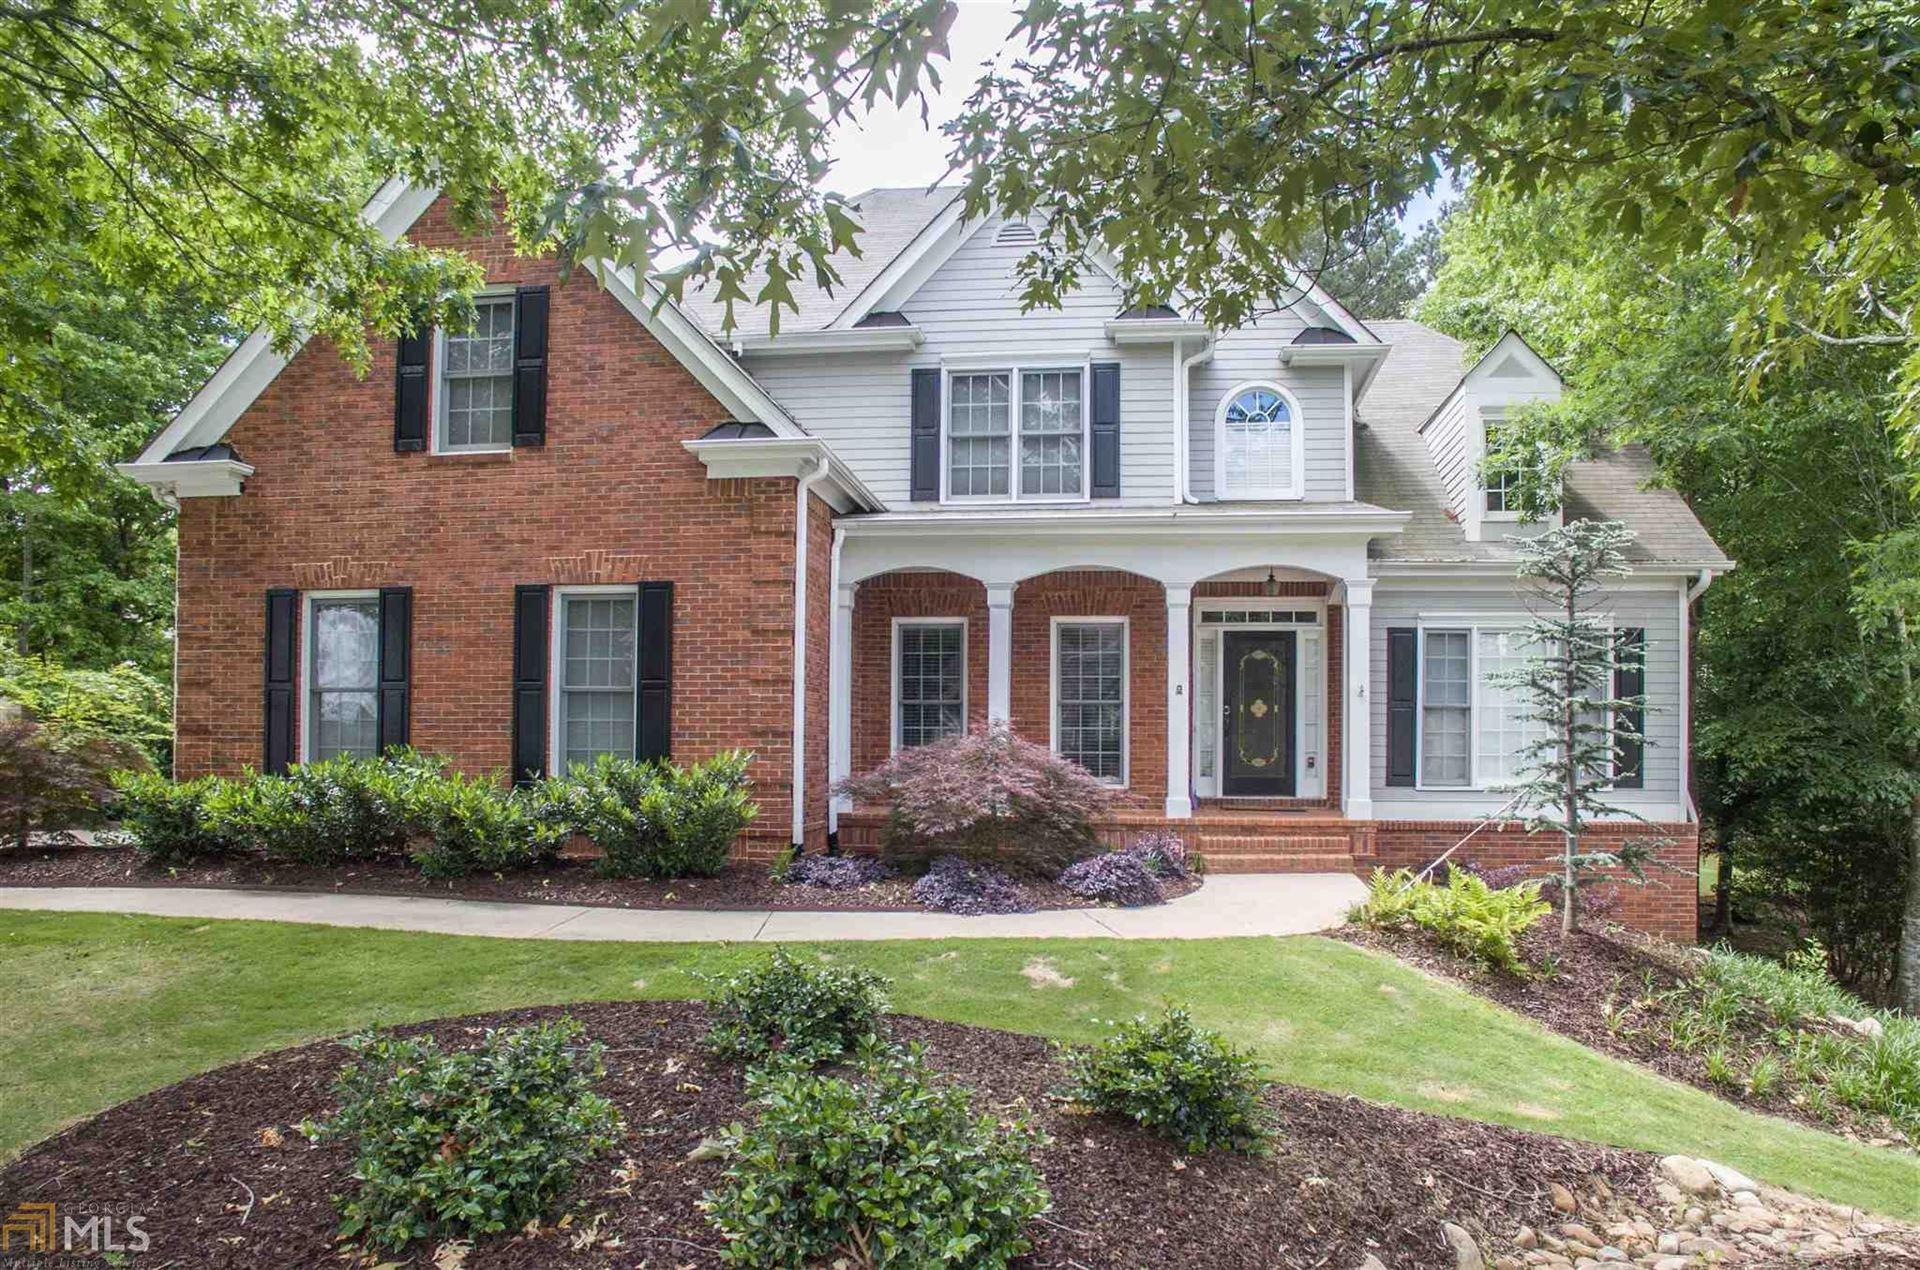 4353 Warmstone Path, Douglasville, GA 30135 - MLS#: 8849496